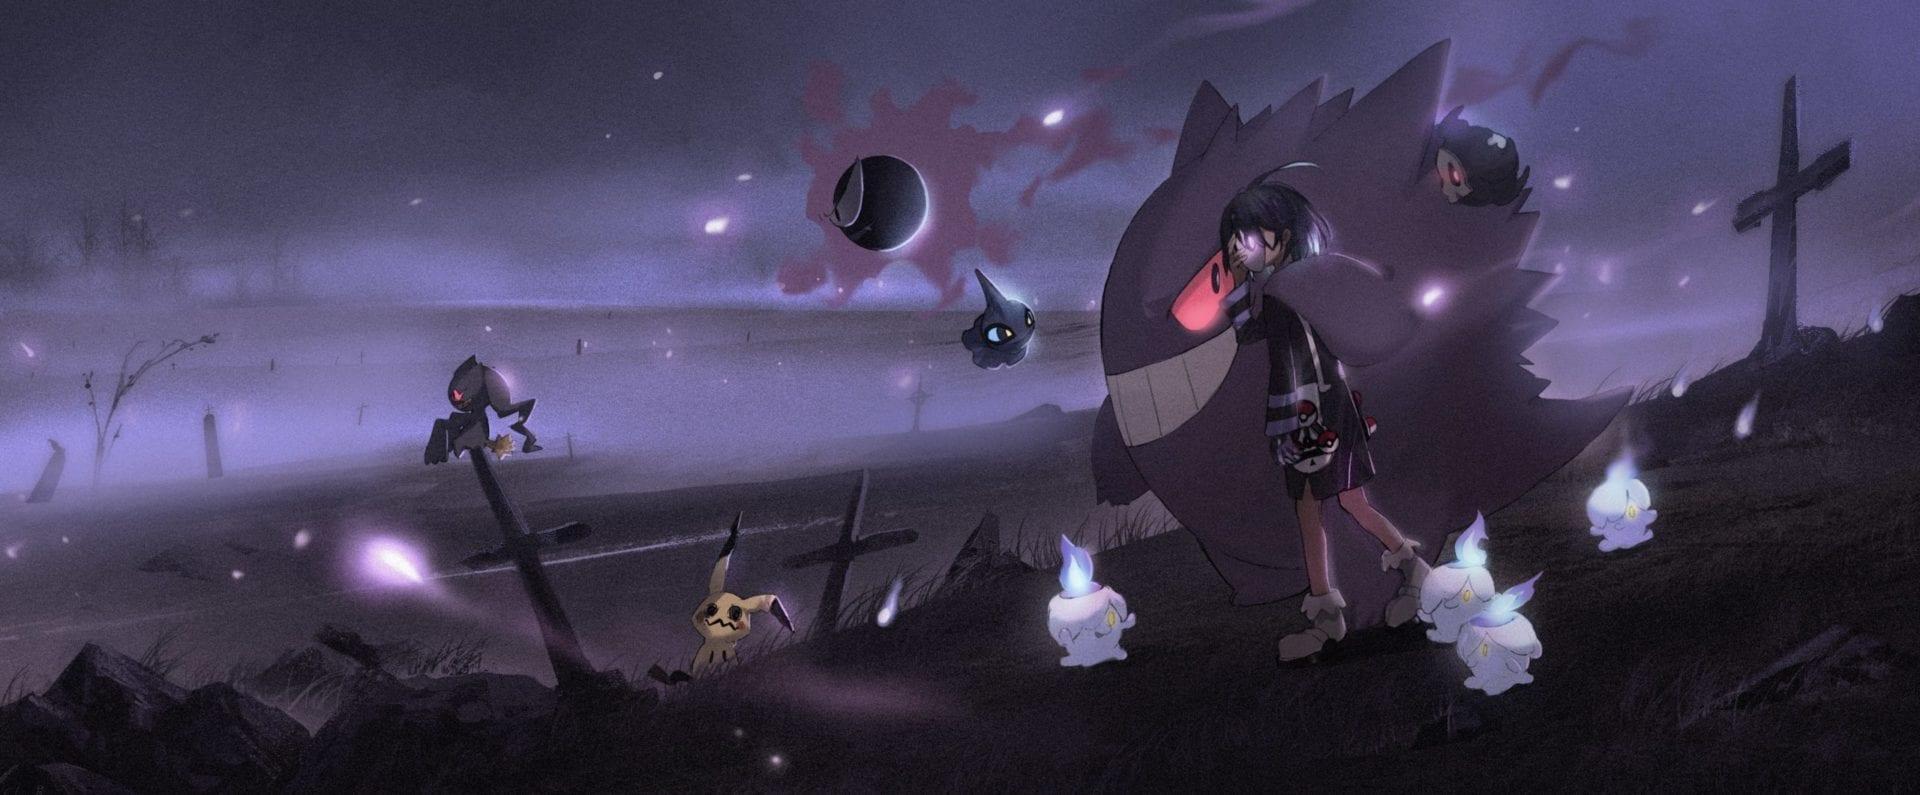 10 HD Pokemon Sword & Shield Wallpapers You Need to Make ...